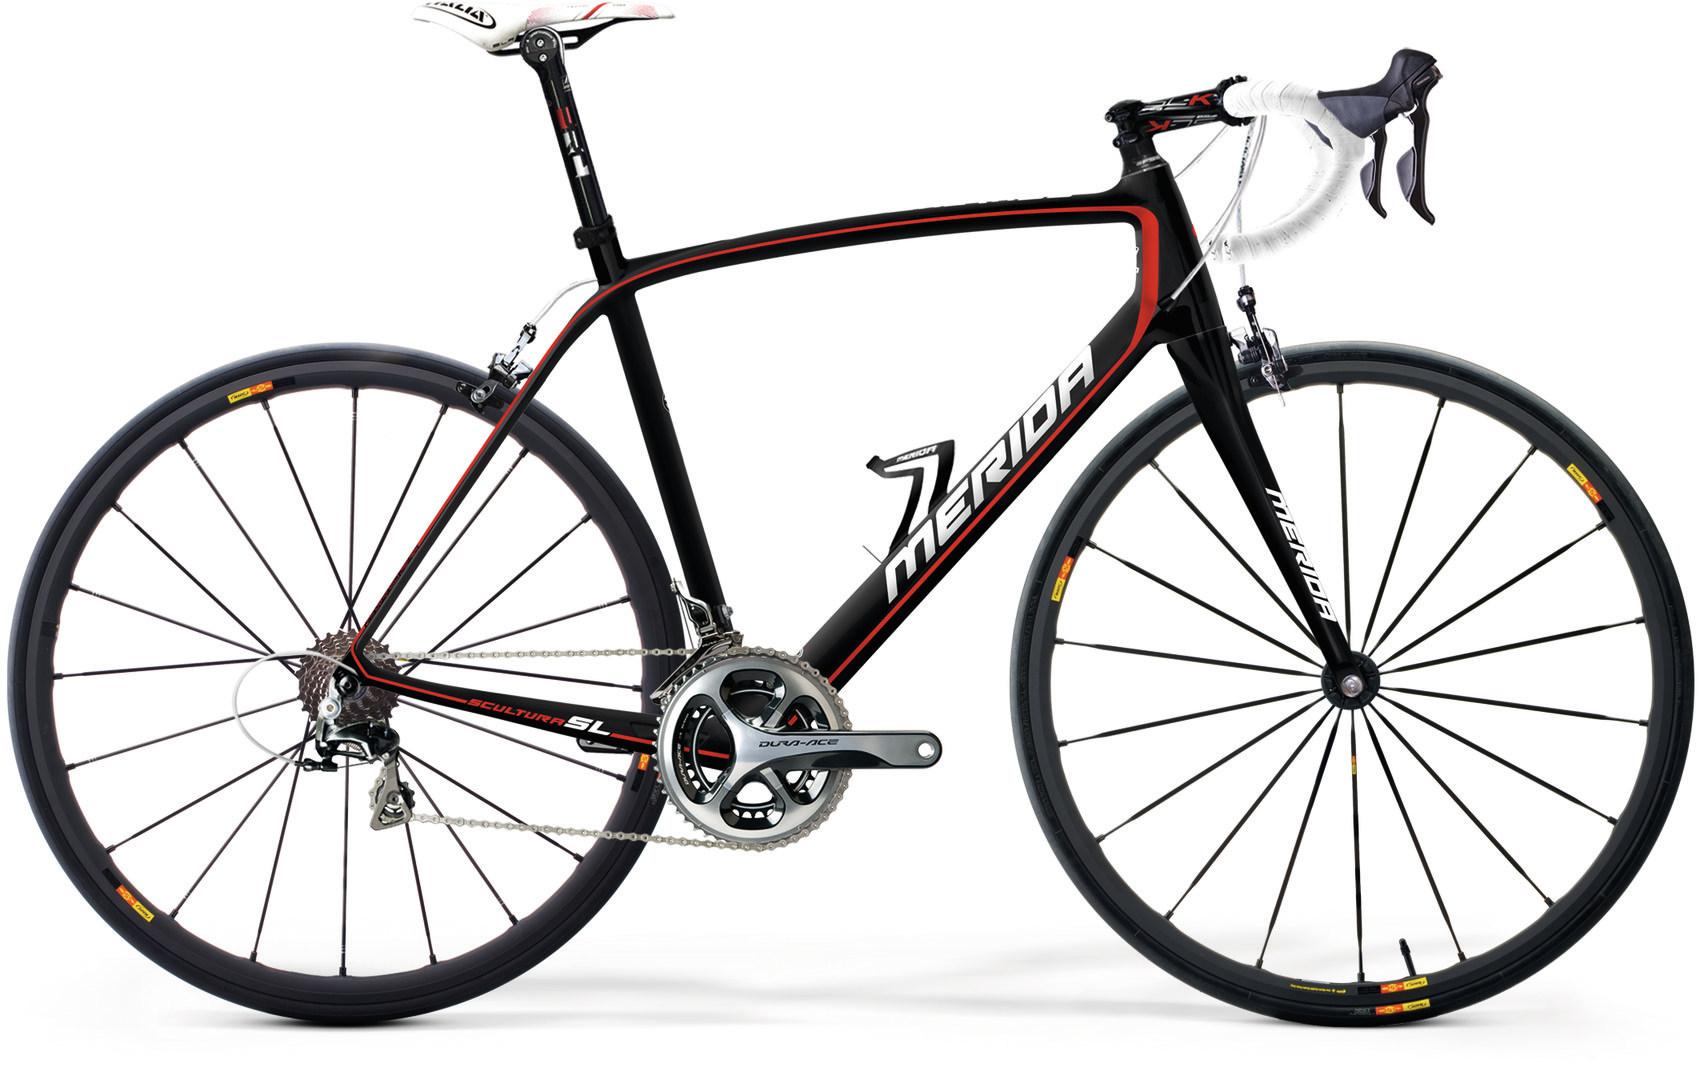 New Merida bikes - www drovercycles co uk